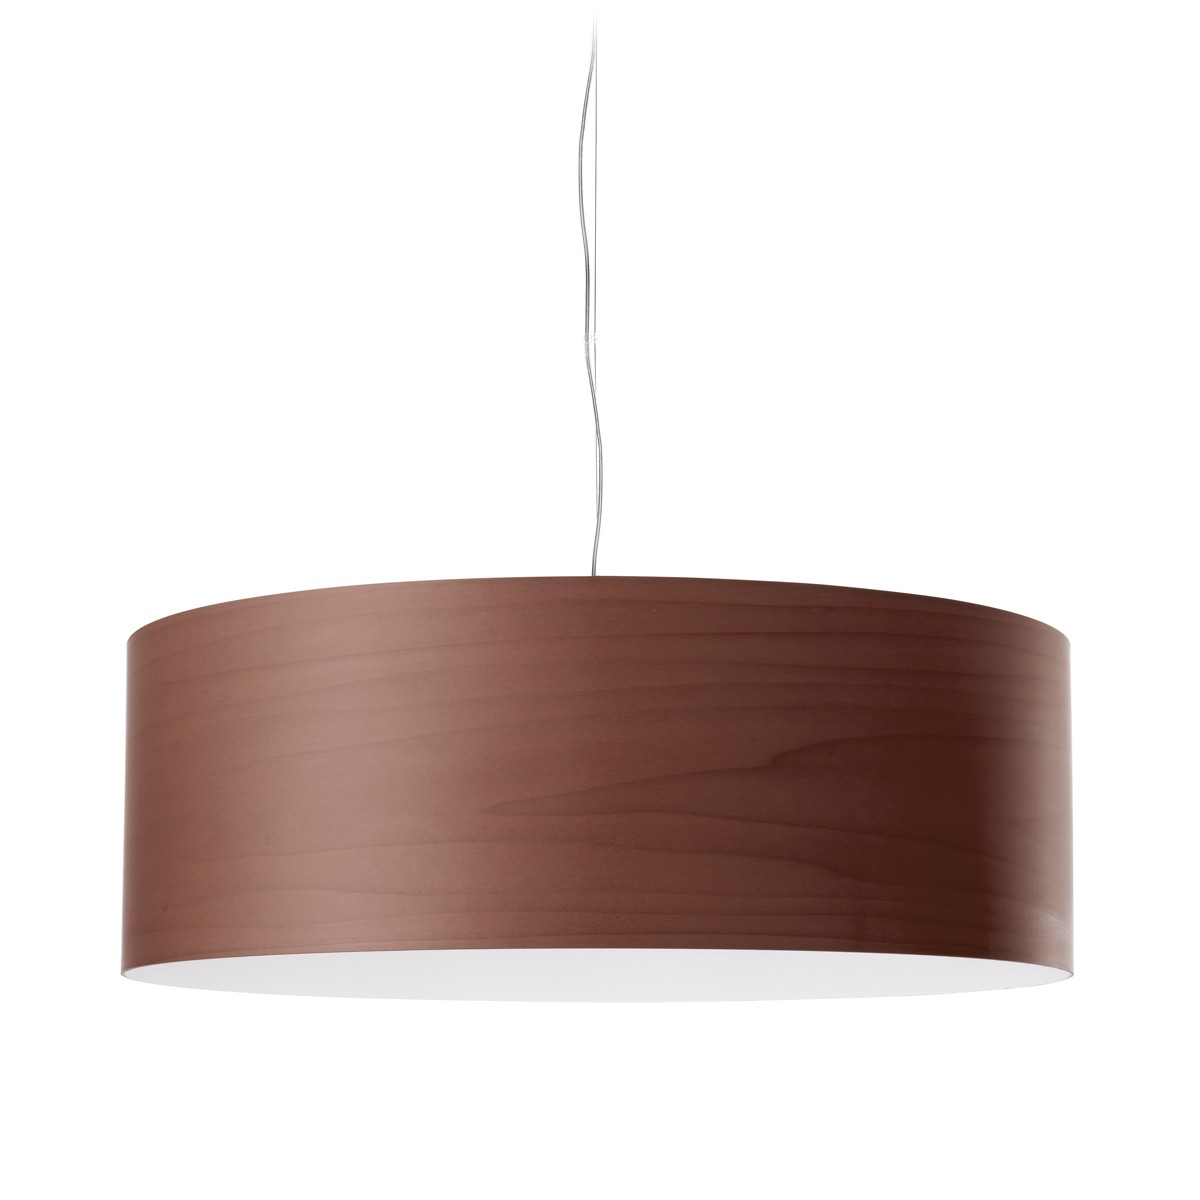 LZF Lamps Gea Large Pendelleuchte, schokolade